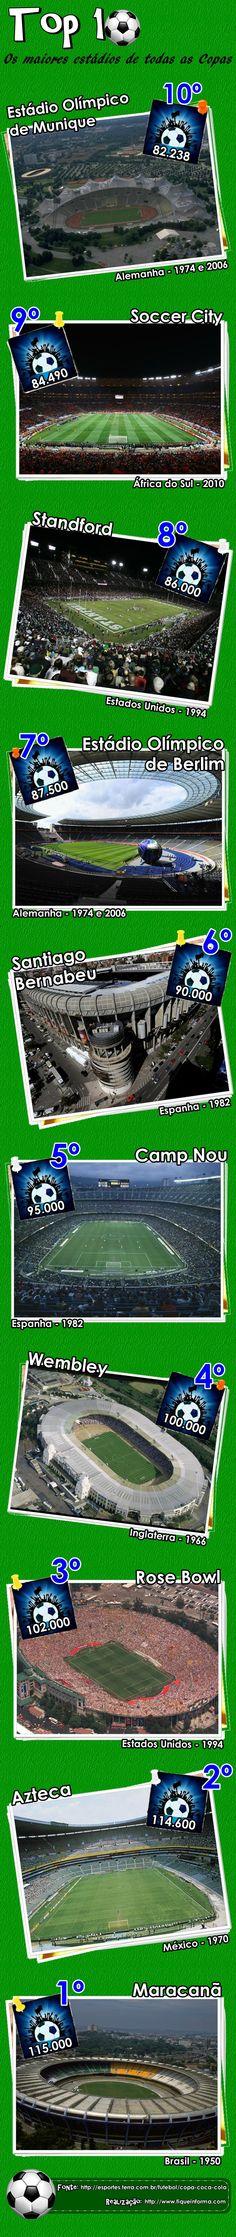 Manchester City 1982 Chemise Homme Football Fanatics